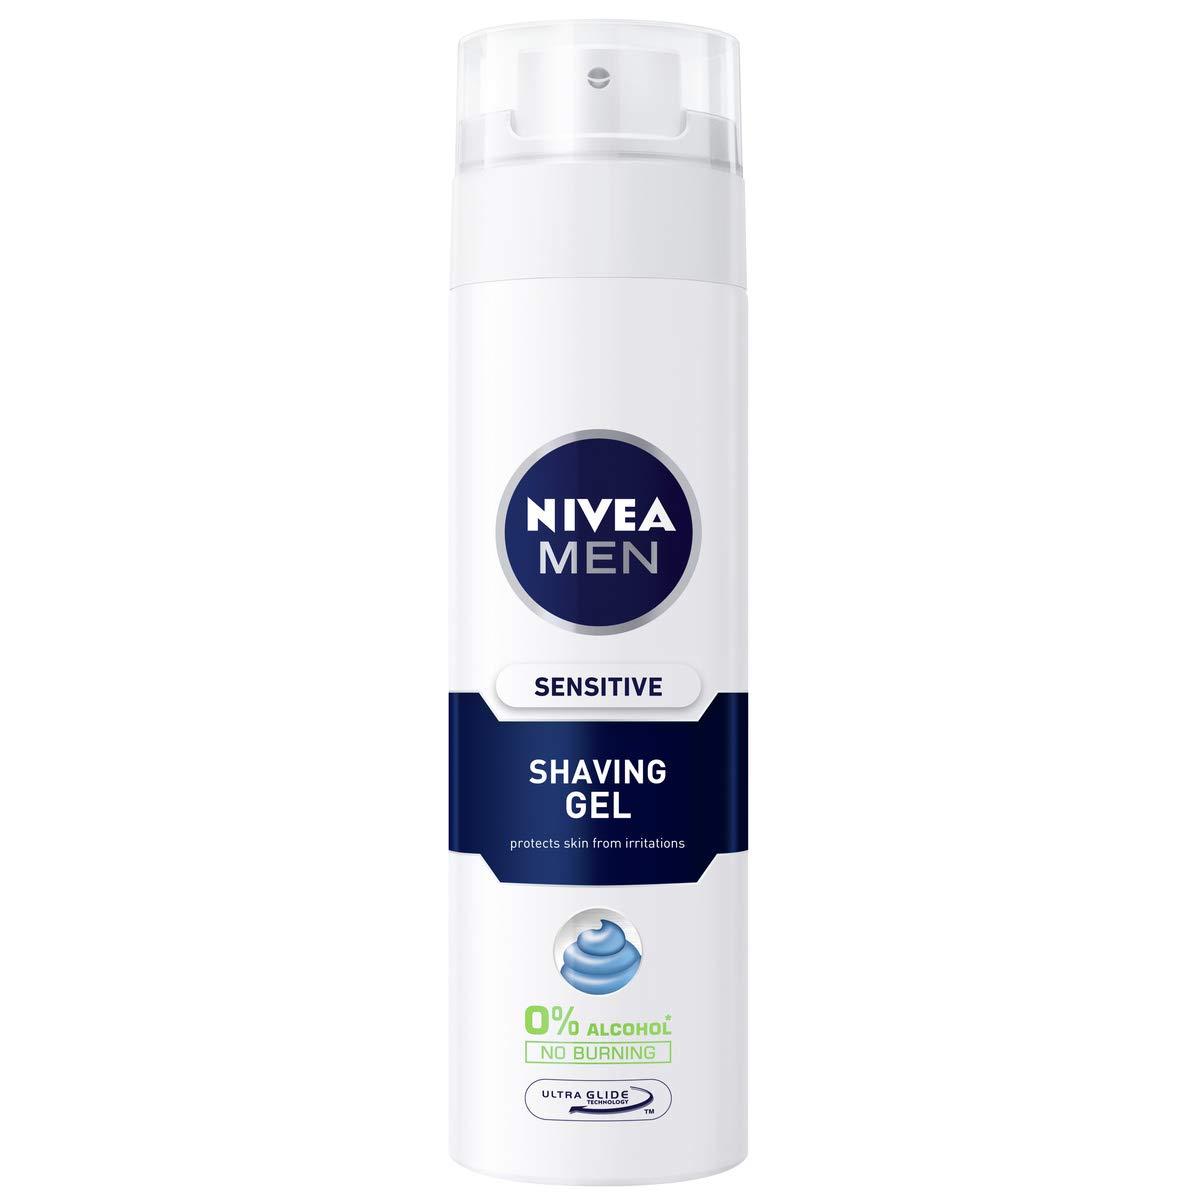 NIVEA MEN Sensitive Shaving Gel Pack of 6 (6 x 200ml)